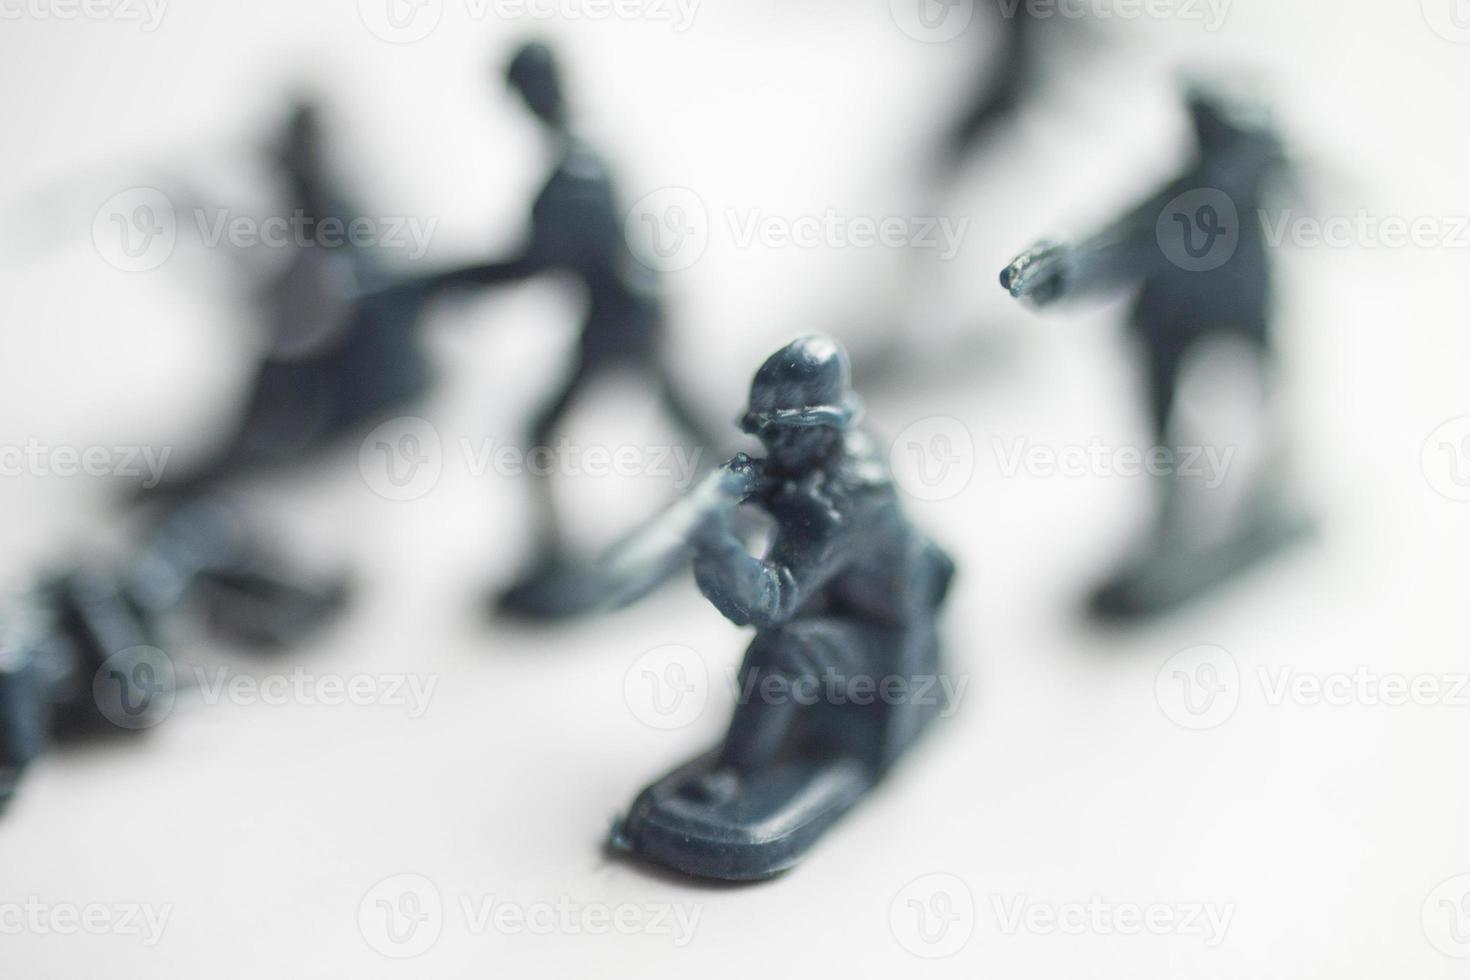 arméleksaker foto